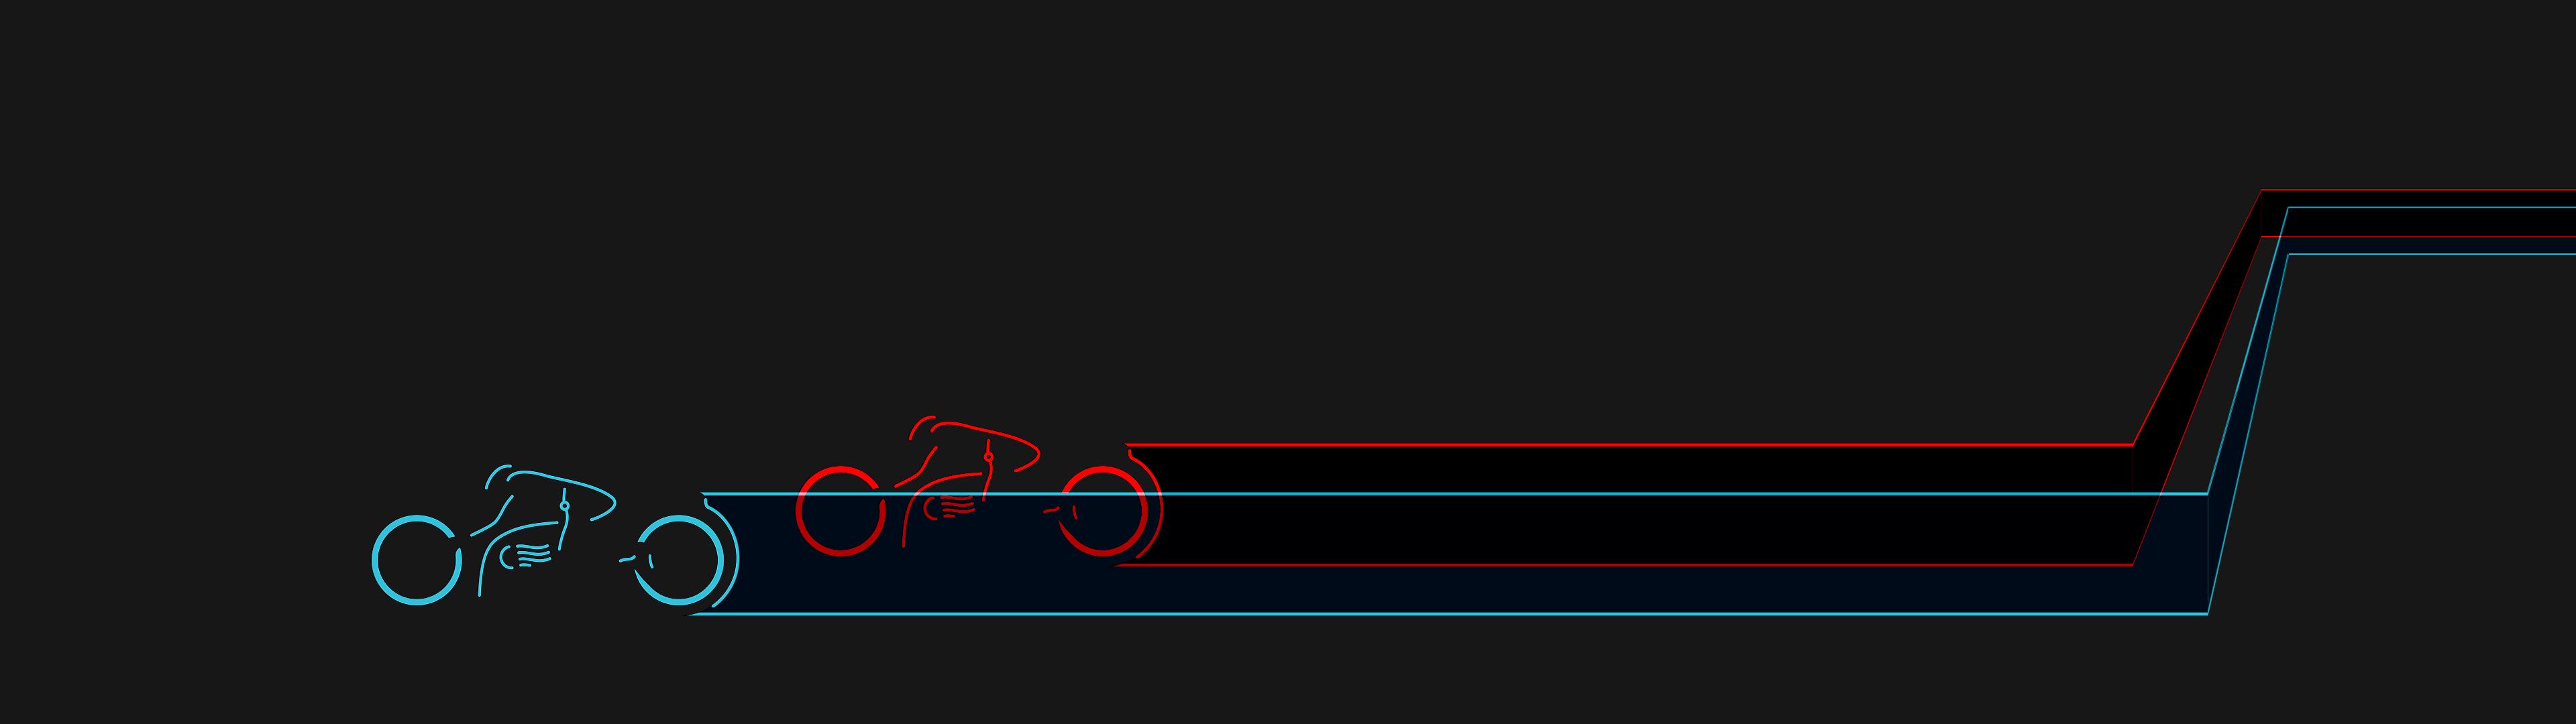 Tron cycles redux   dual screen [3840x1080] iimgurcom 3840x1080